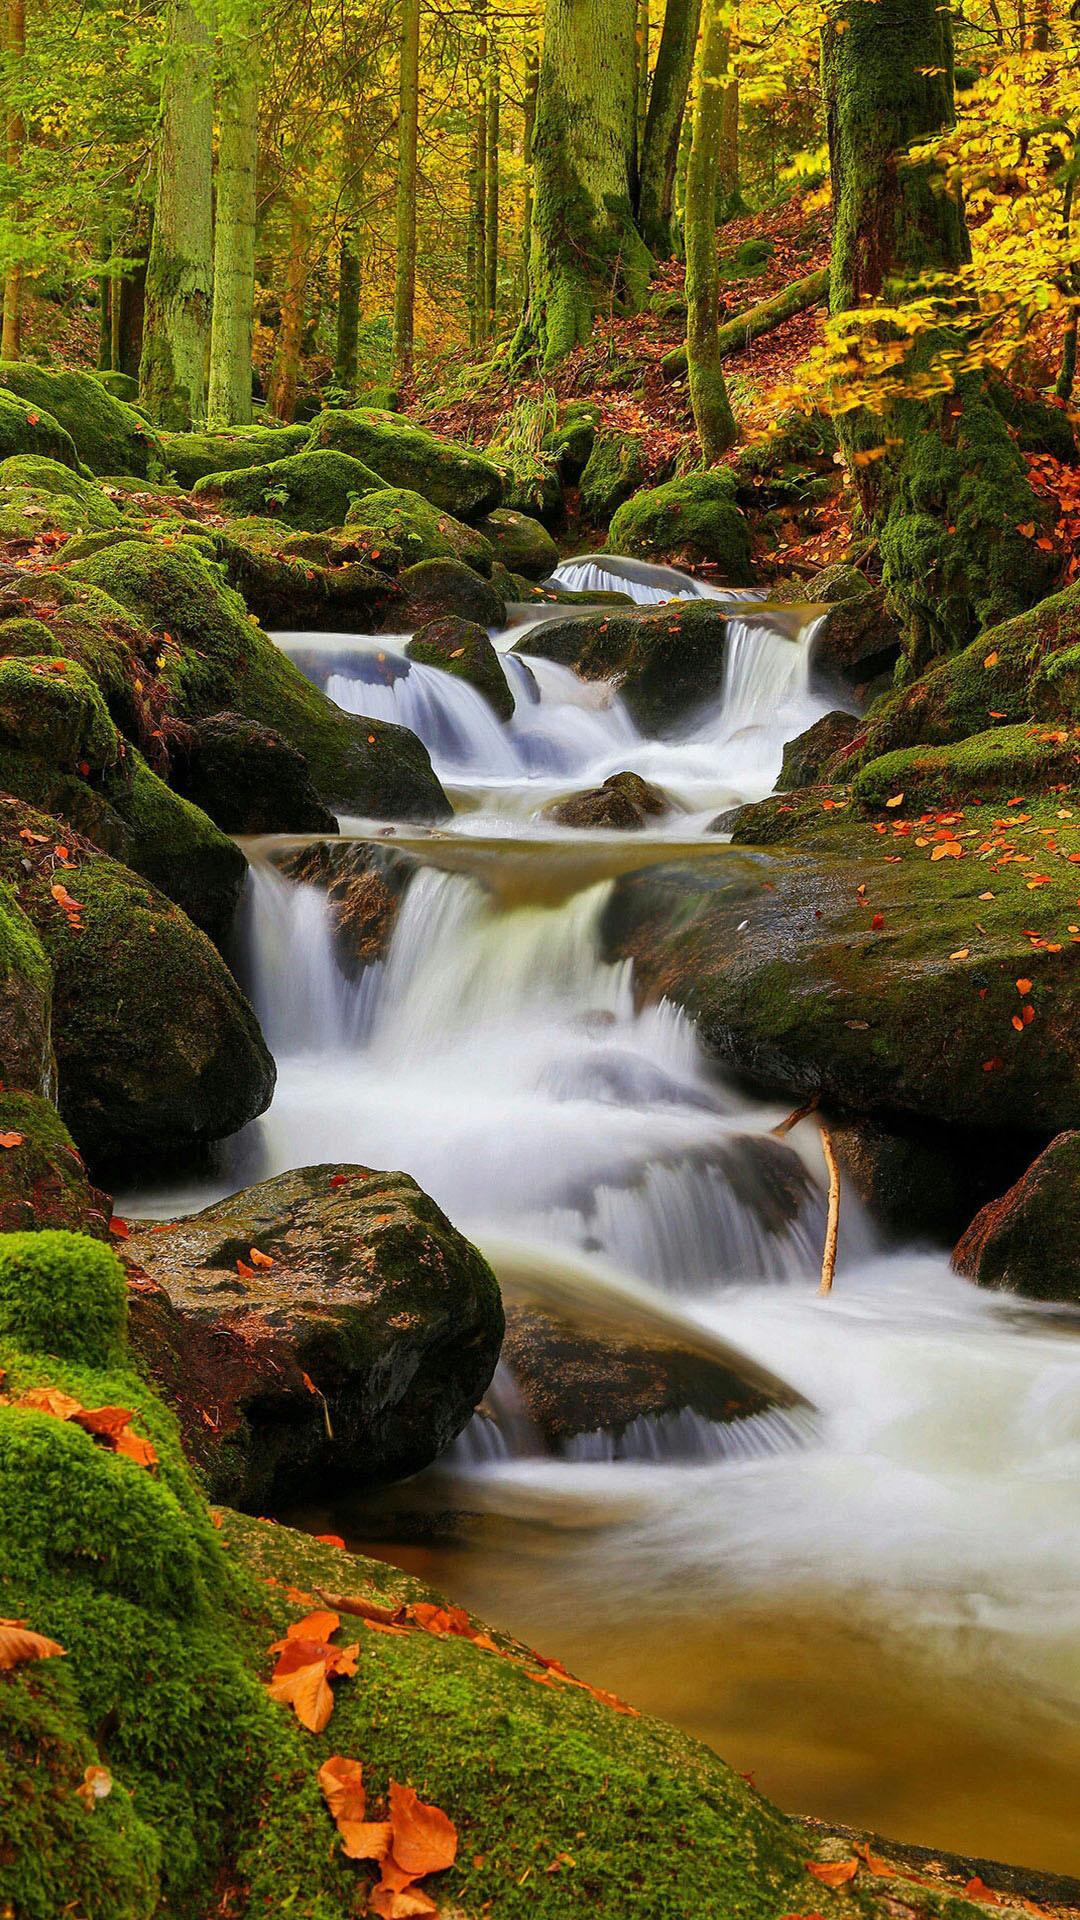 Waterfall nature mobile wallpaper